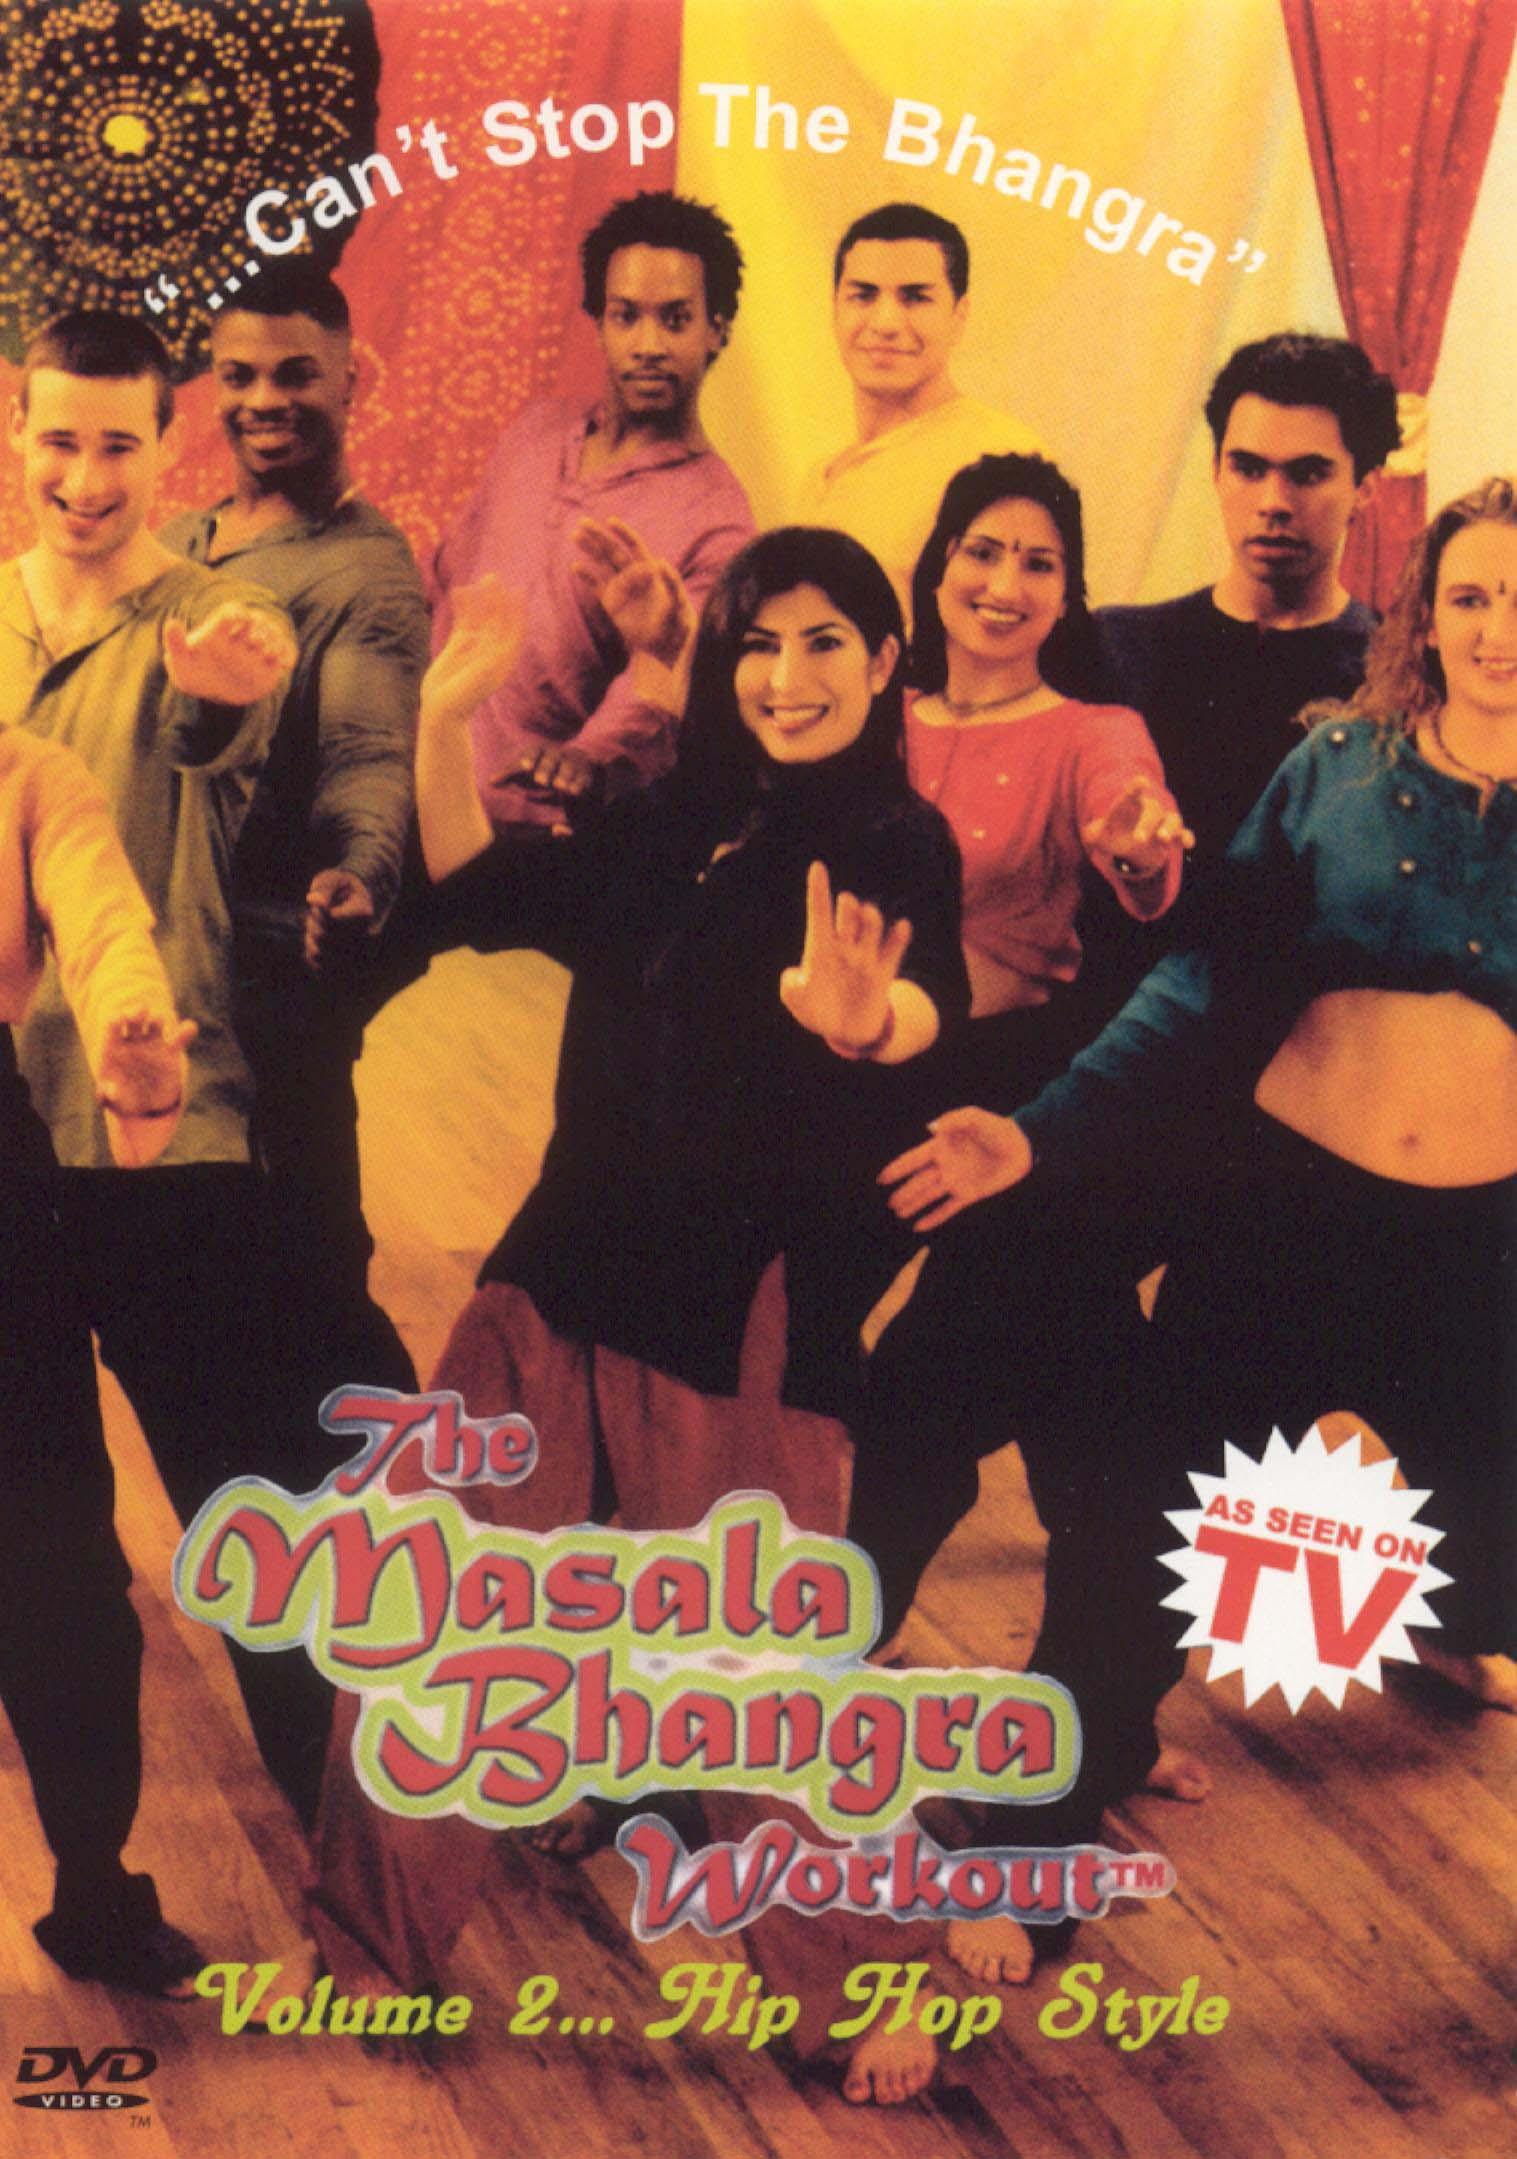 Masala Bhangra Workout, Vol. 2: Hip Hop Style